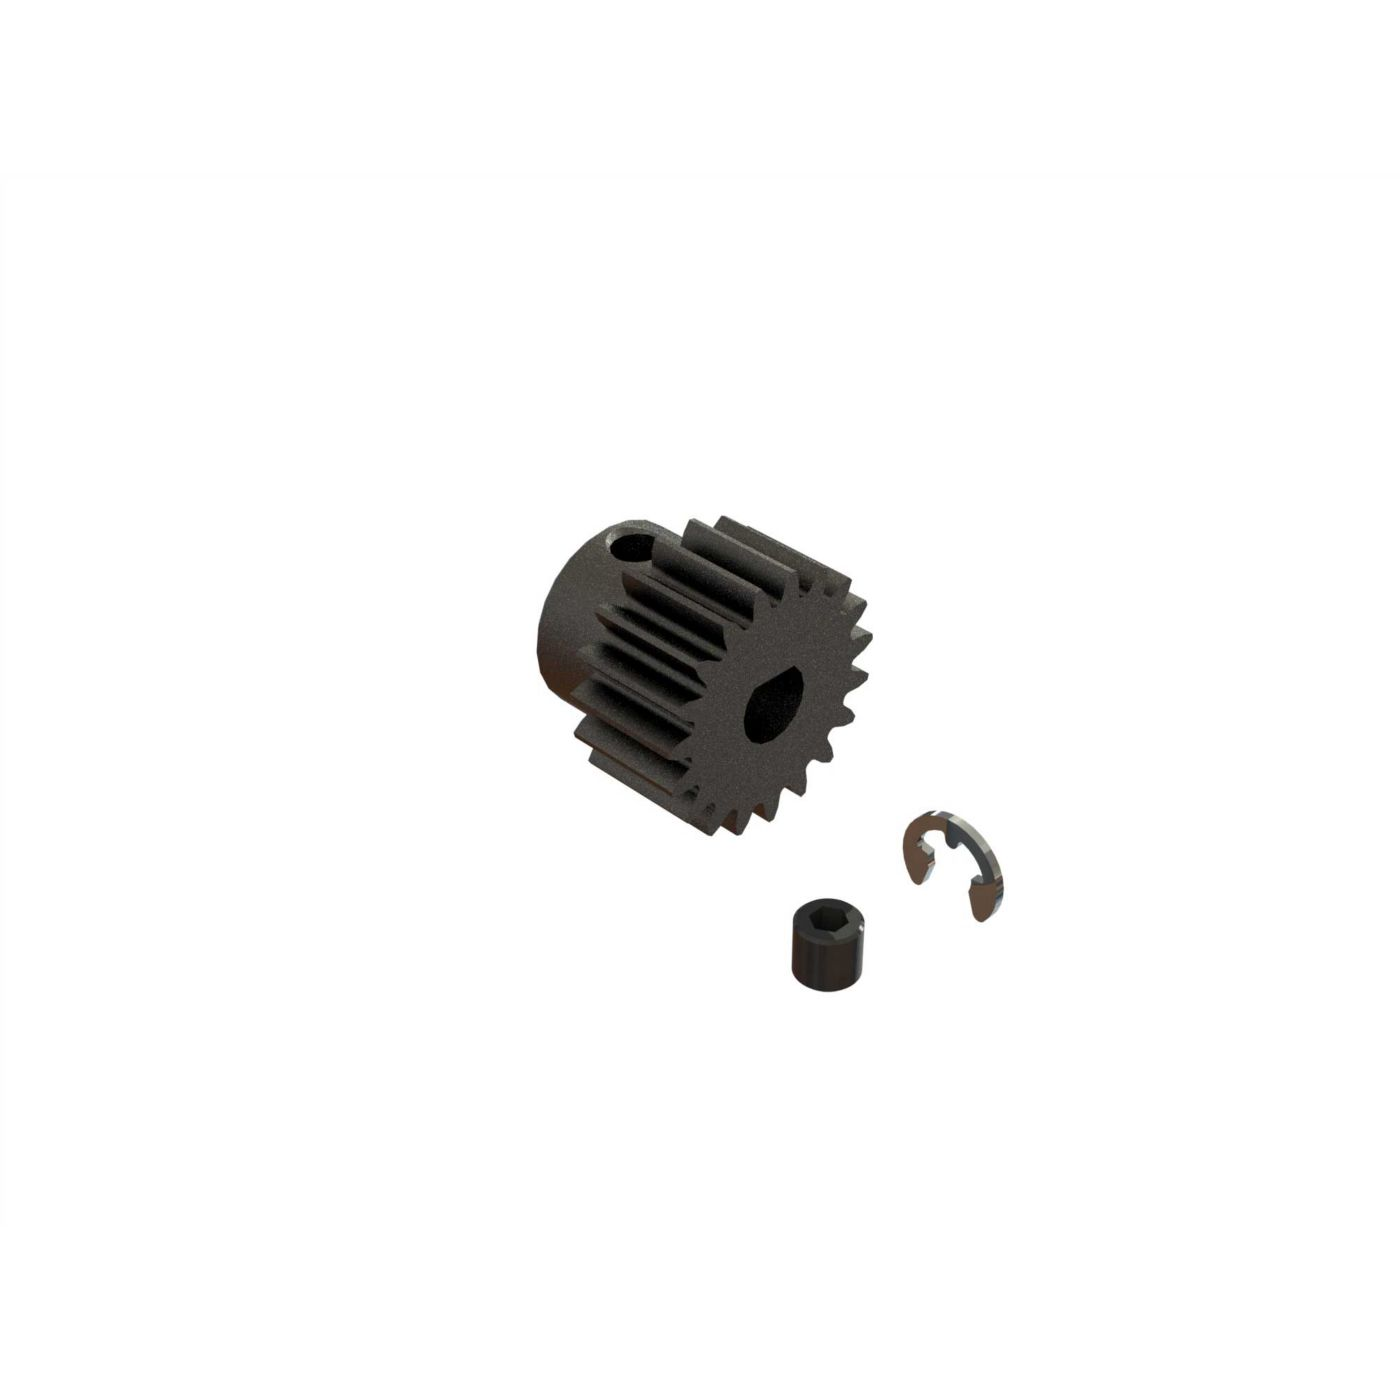 20T 0.8Mod Safe-D5 Pinion Gear